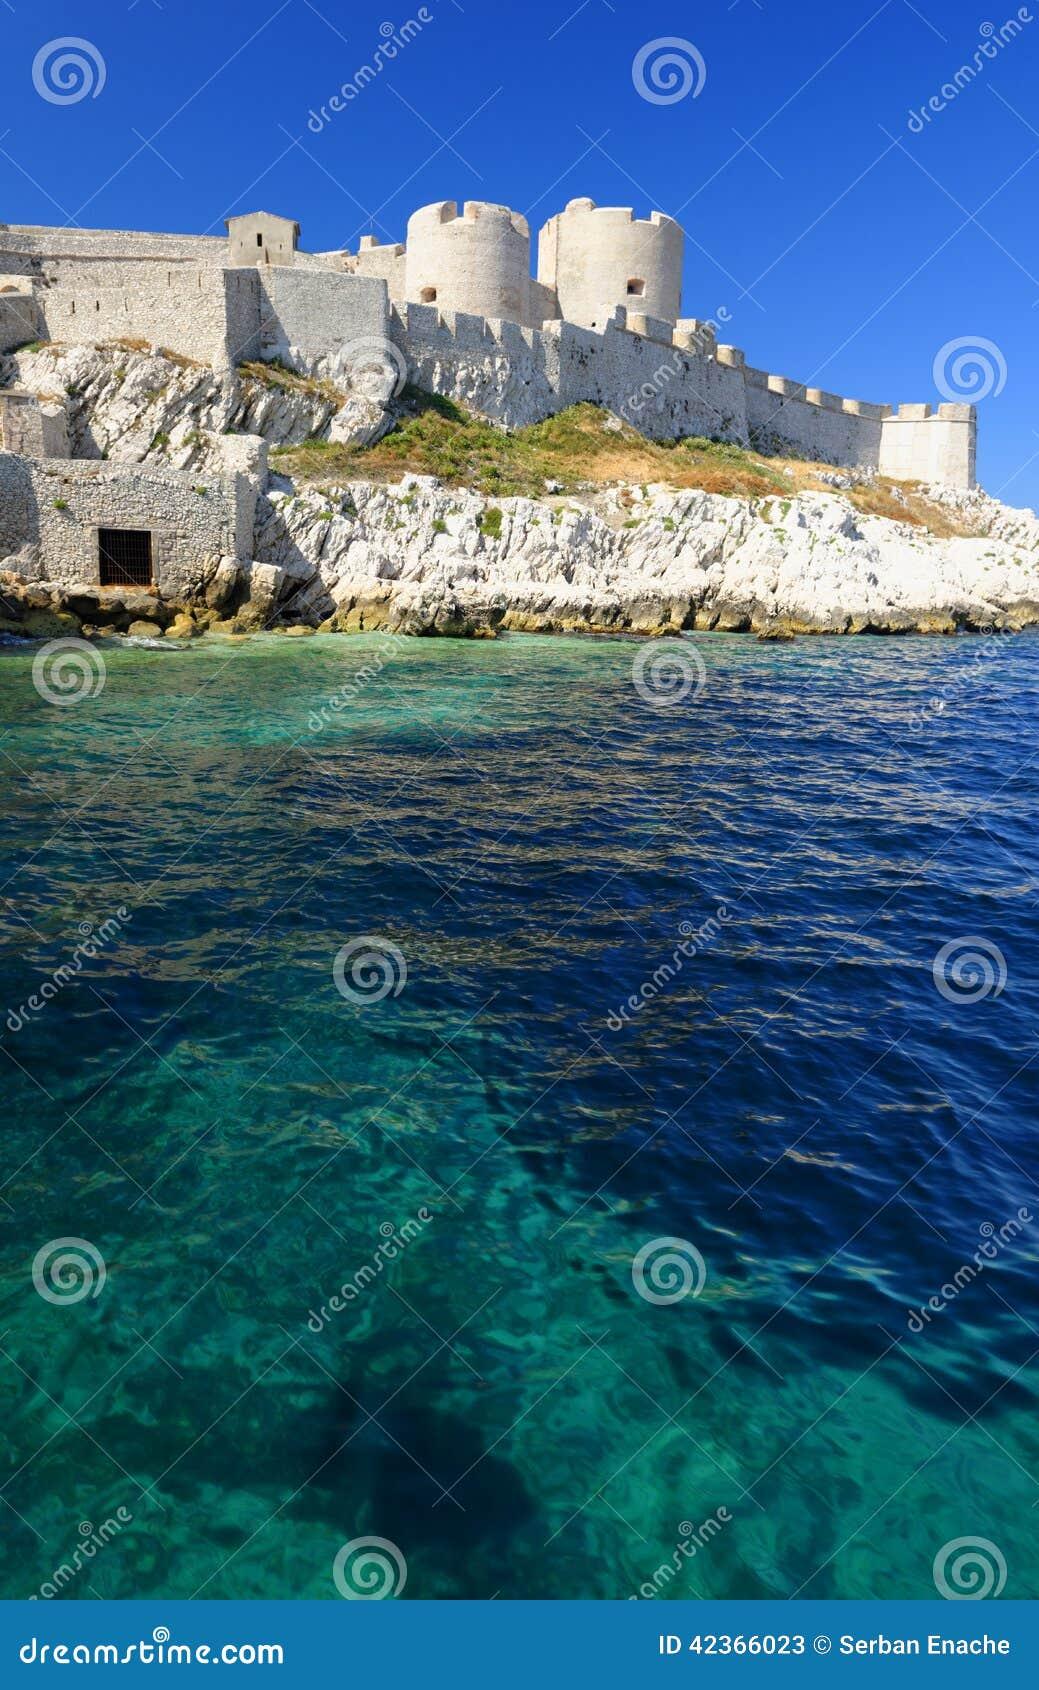 Старый белый каменный прибрежный замок